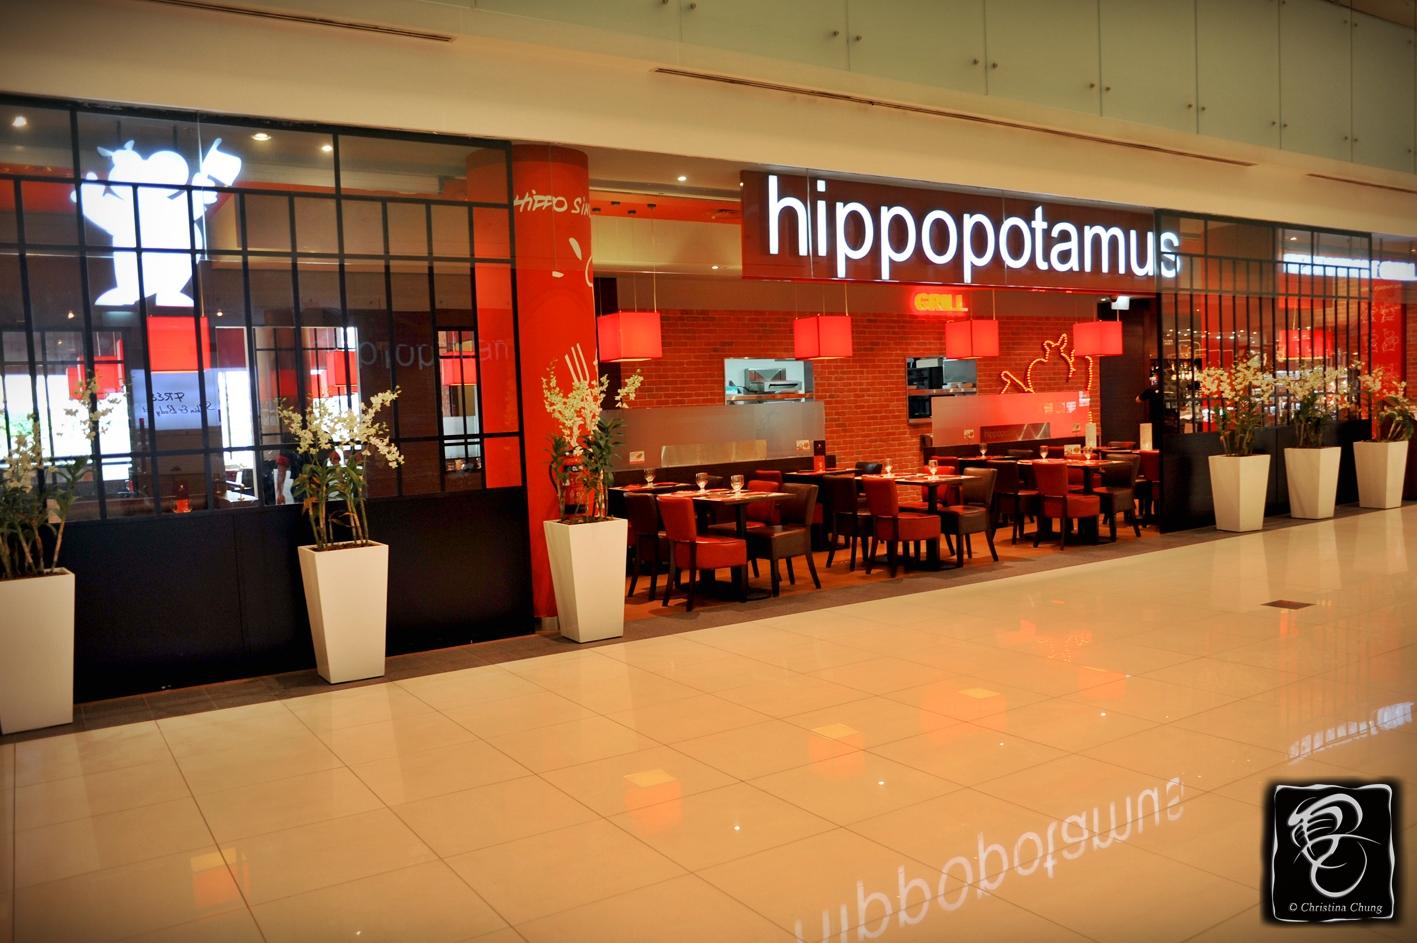 D licieux food hippopotamus restaurant grill huney 39 z world - Hippopotamus restaurant grill ...